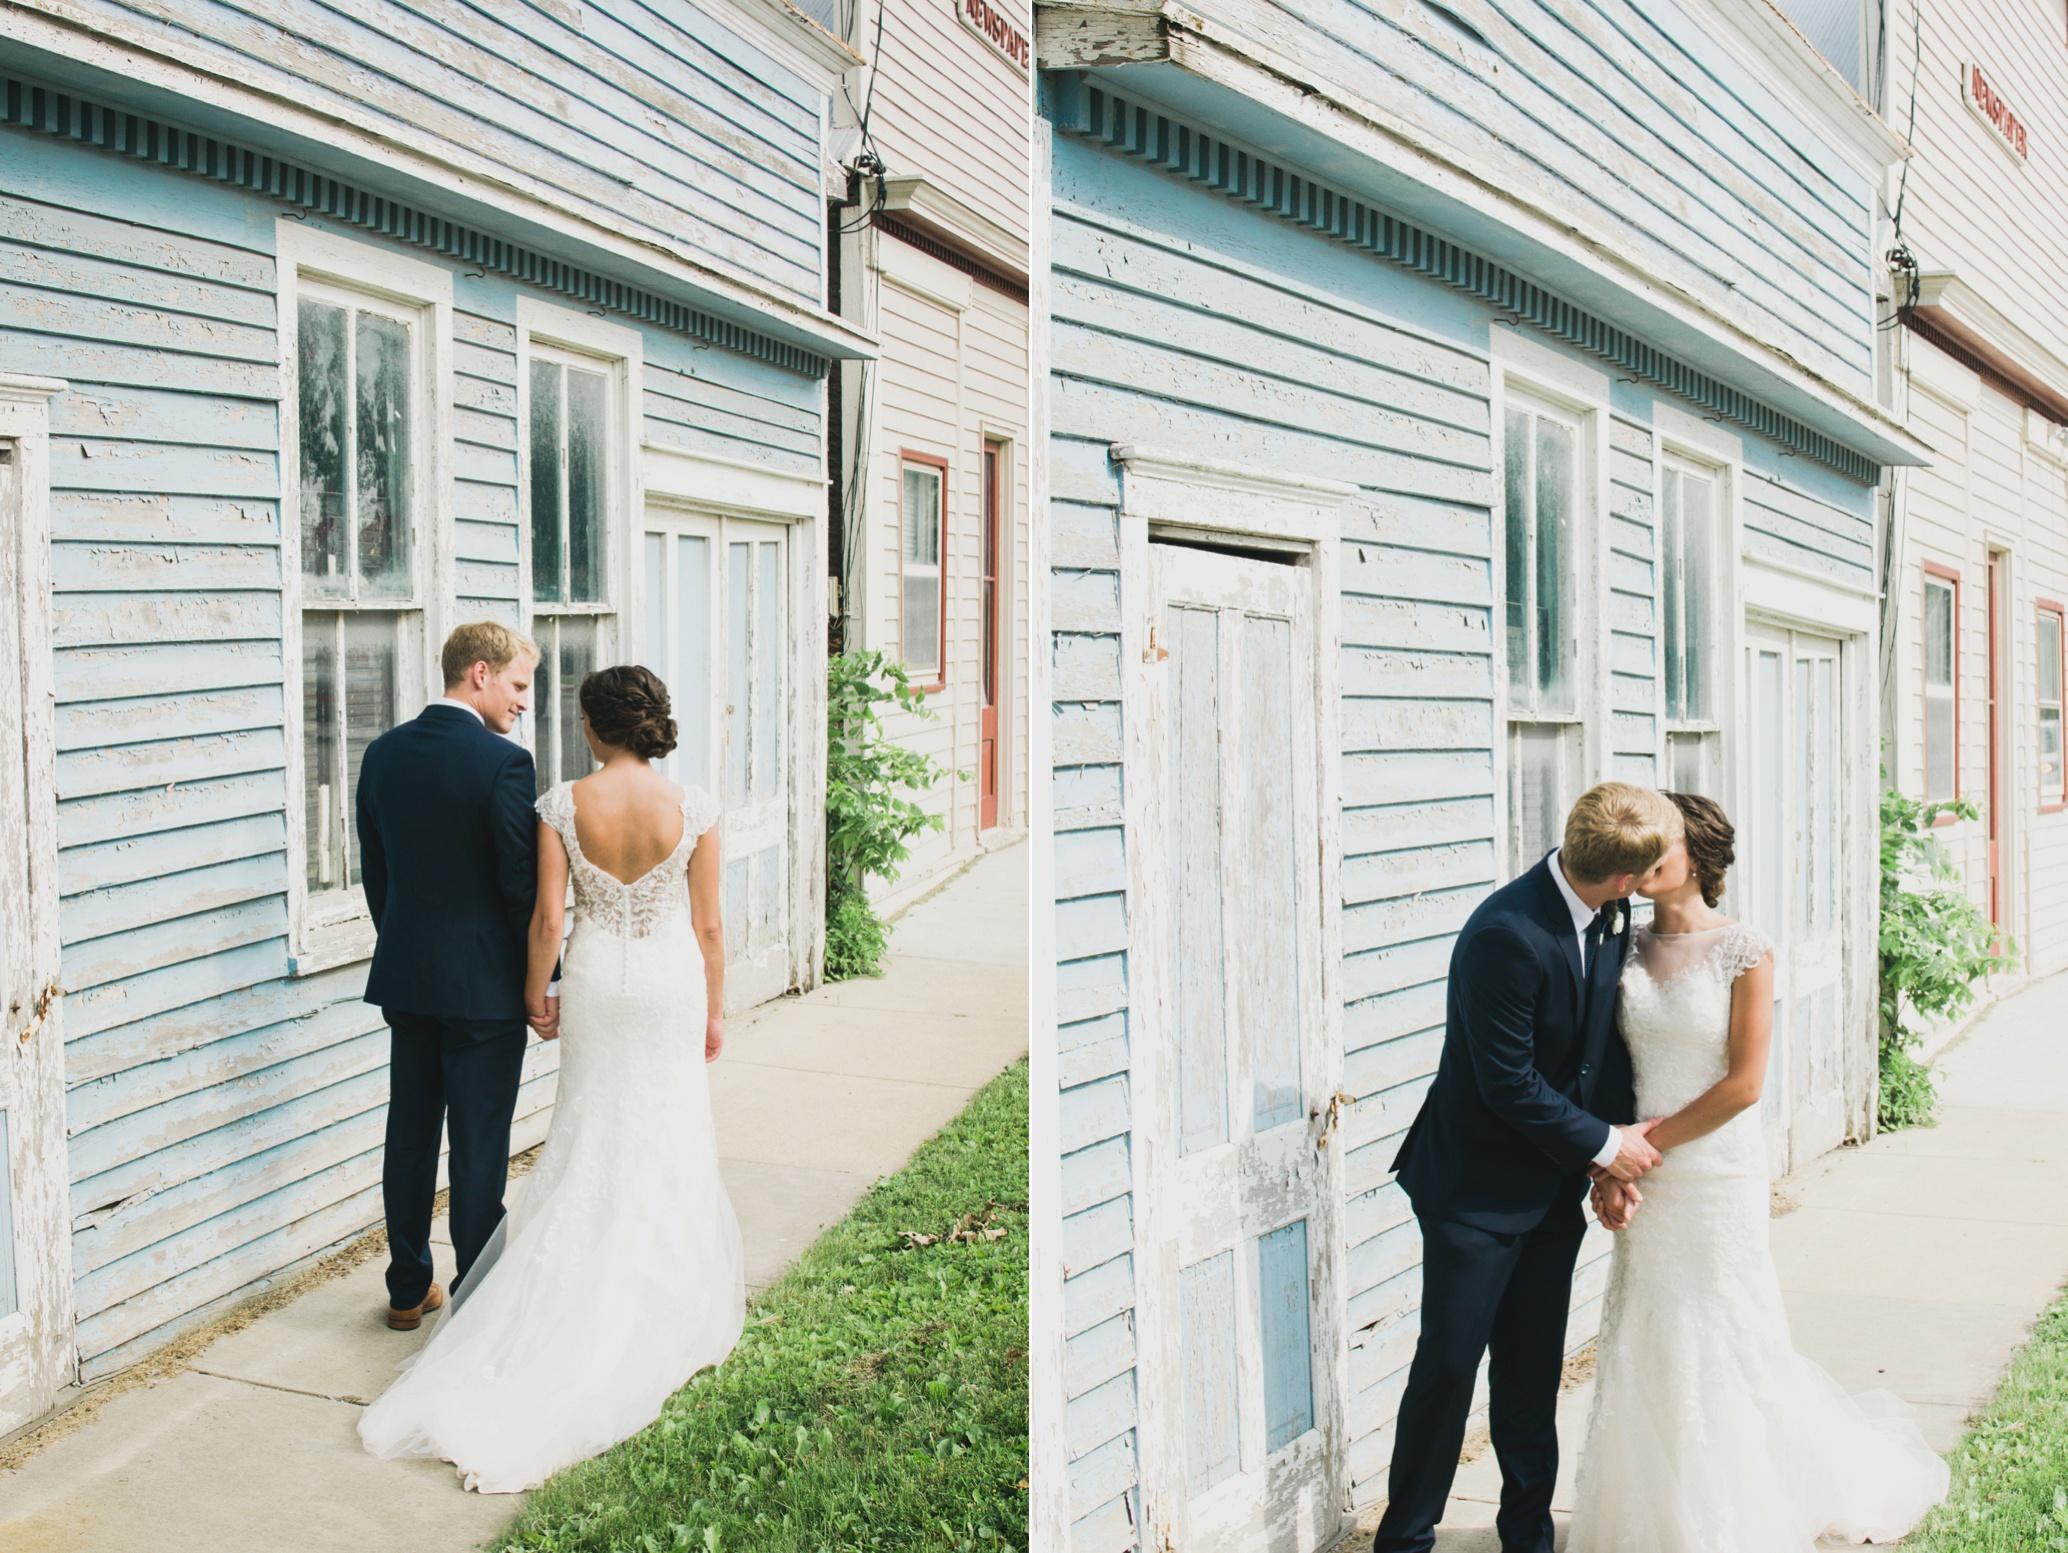 Palmer House and Stable Solon, IA | Ali Leigh Photo Minneapolis Wedding Photographer_0284.jpg